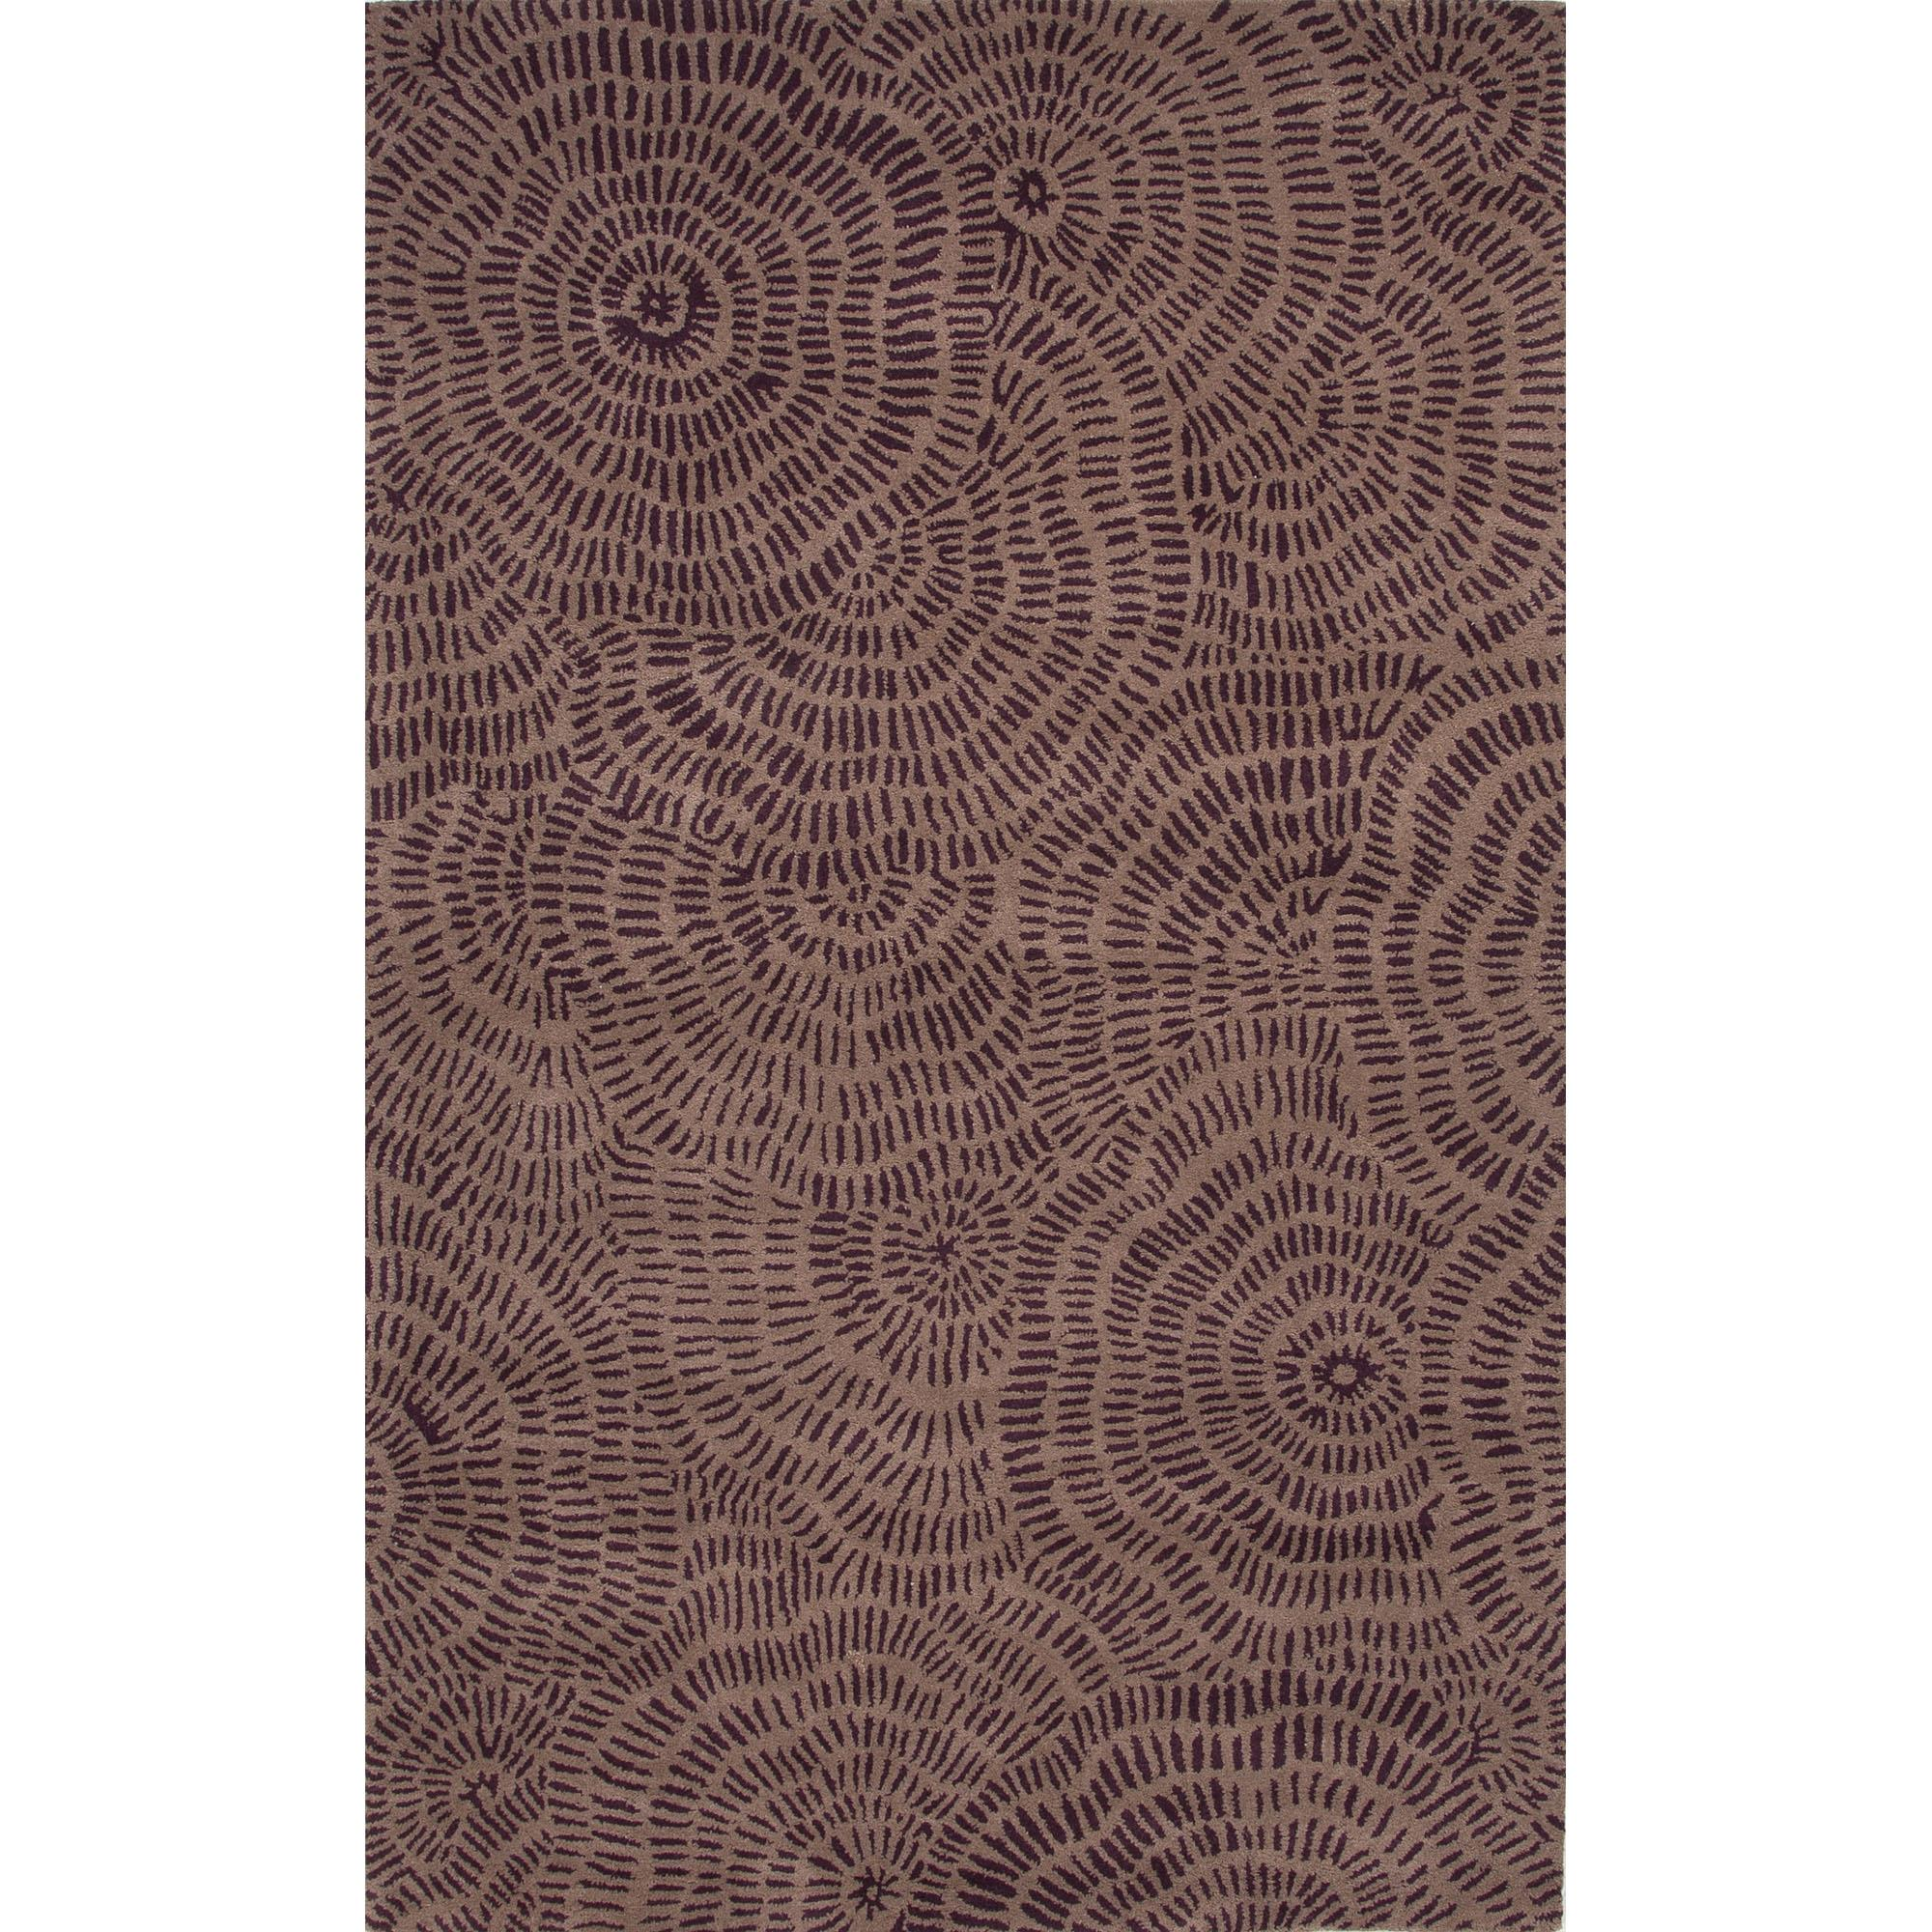 JAIPUR Rugs En Casa By Luli Sanchez Tufted 2 x 3 Rug - Item Number: RUG118146